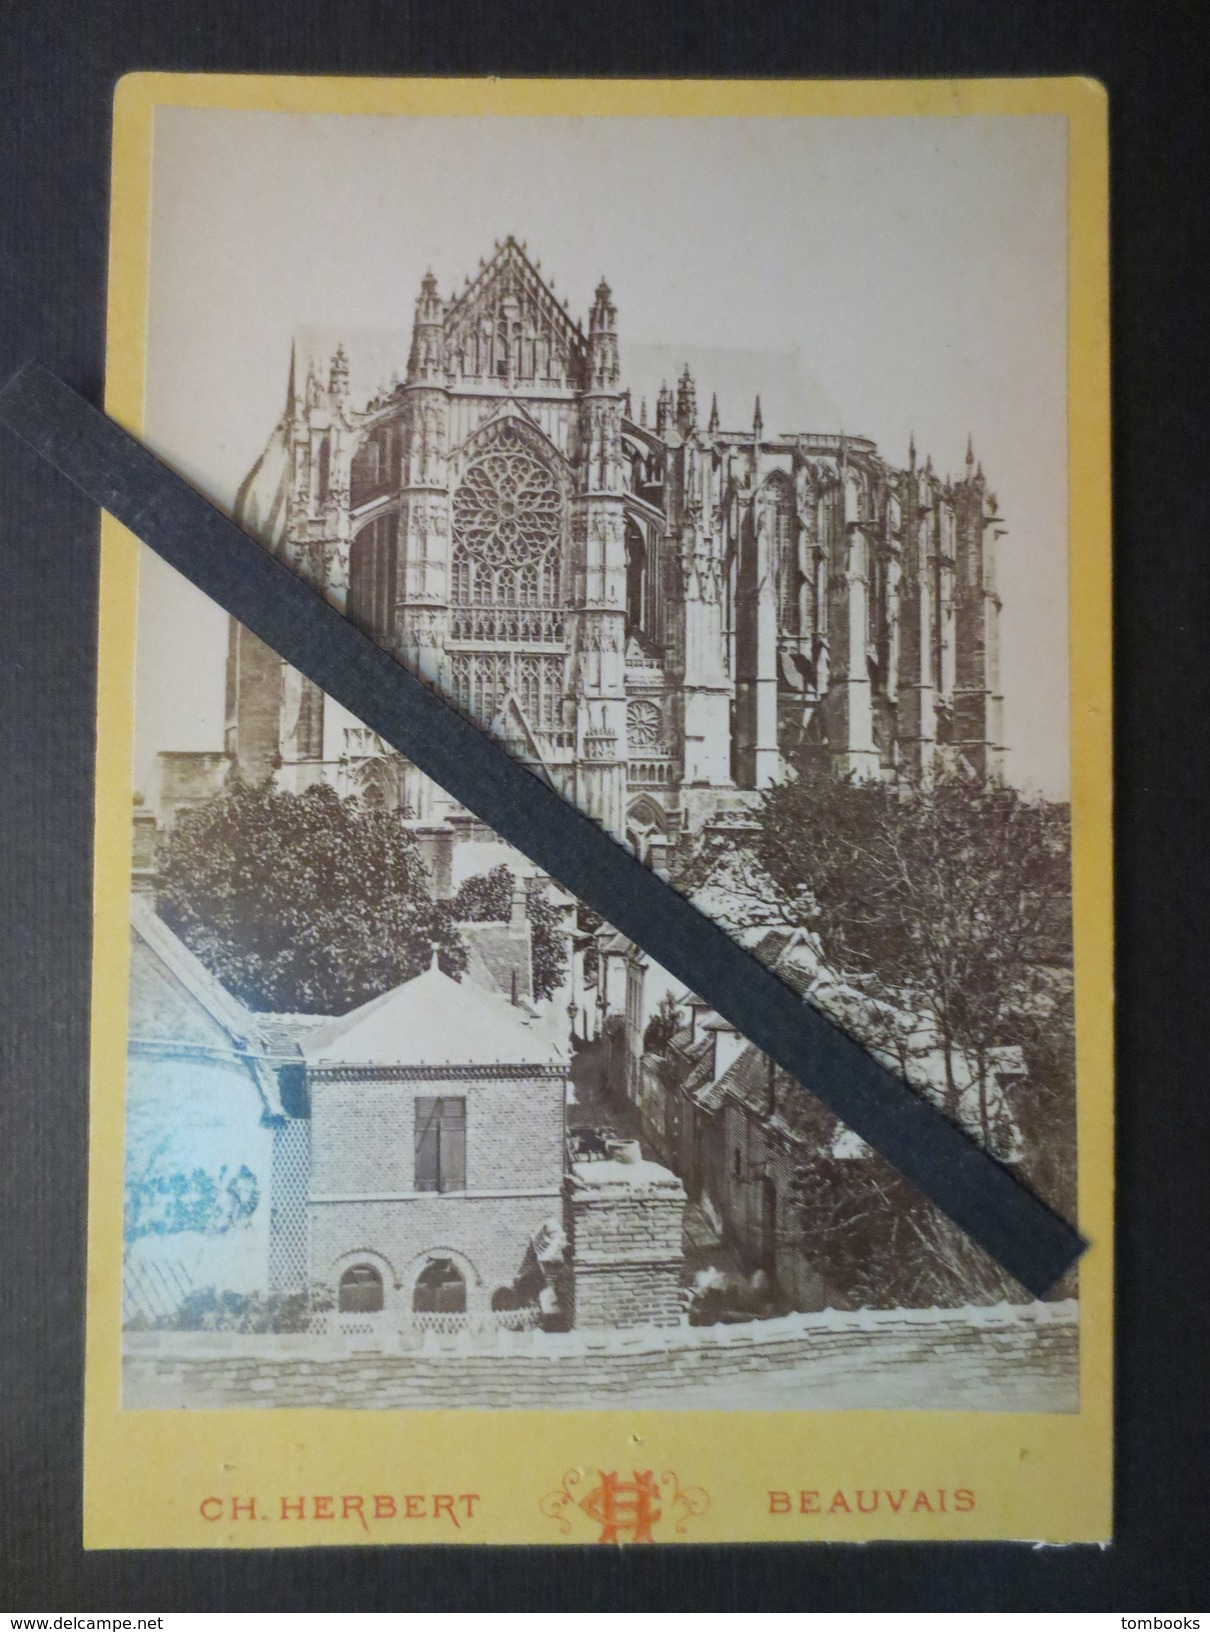 60 - Beauvais  - Photo Originale - Fin XIX E - Cathédrale Saint - Pierre   - CH . Herbert   - TBE - - Luoghi